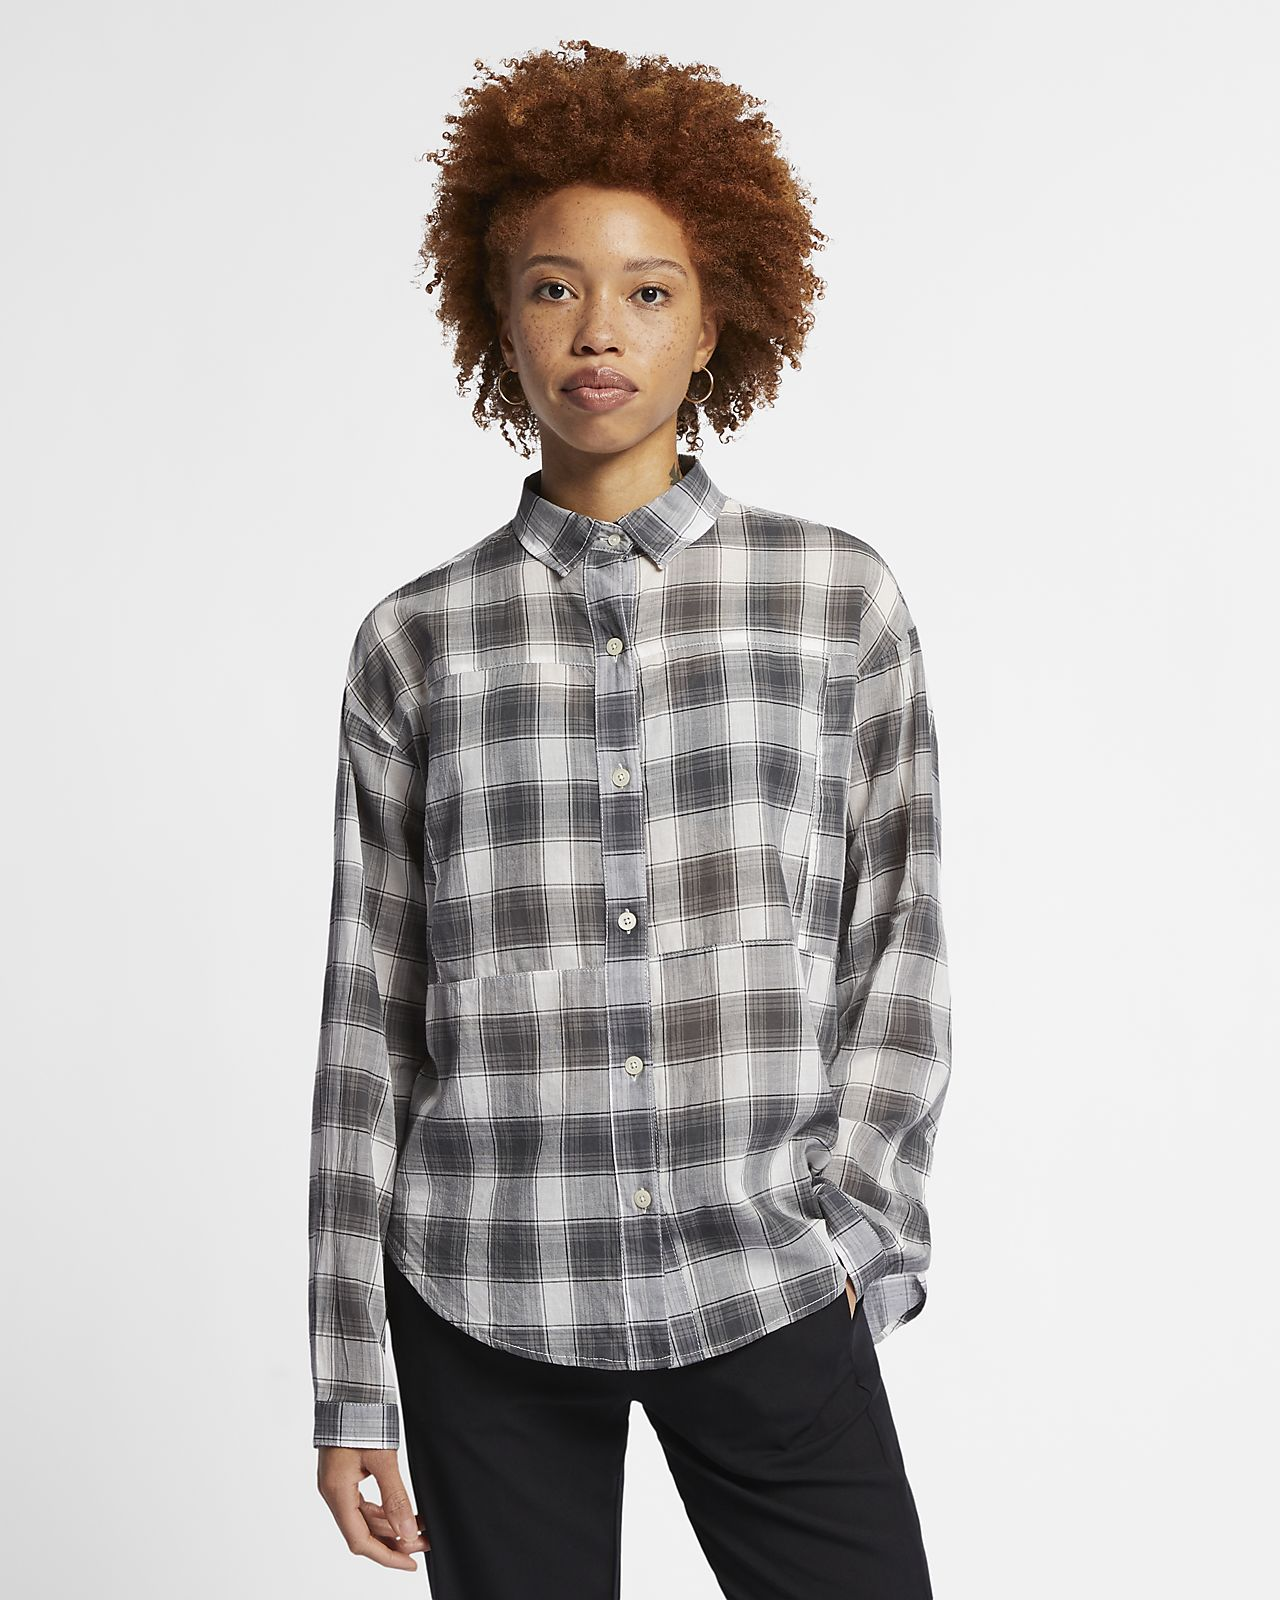 1aa93fa6a1 Camisa de manga comprida axadrezada Hurley Wilson para mulher. Nike ...